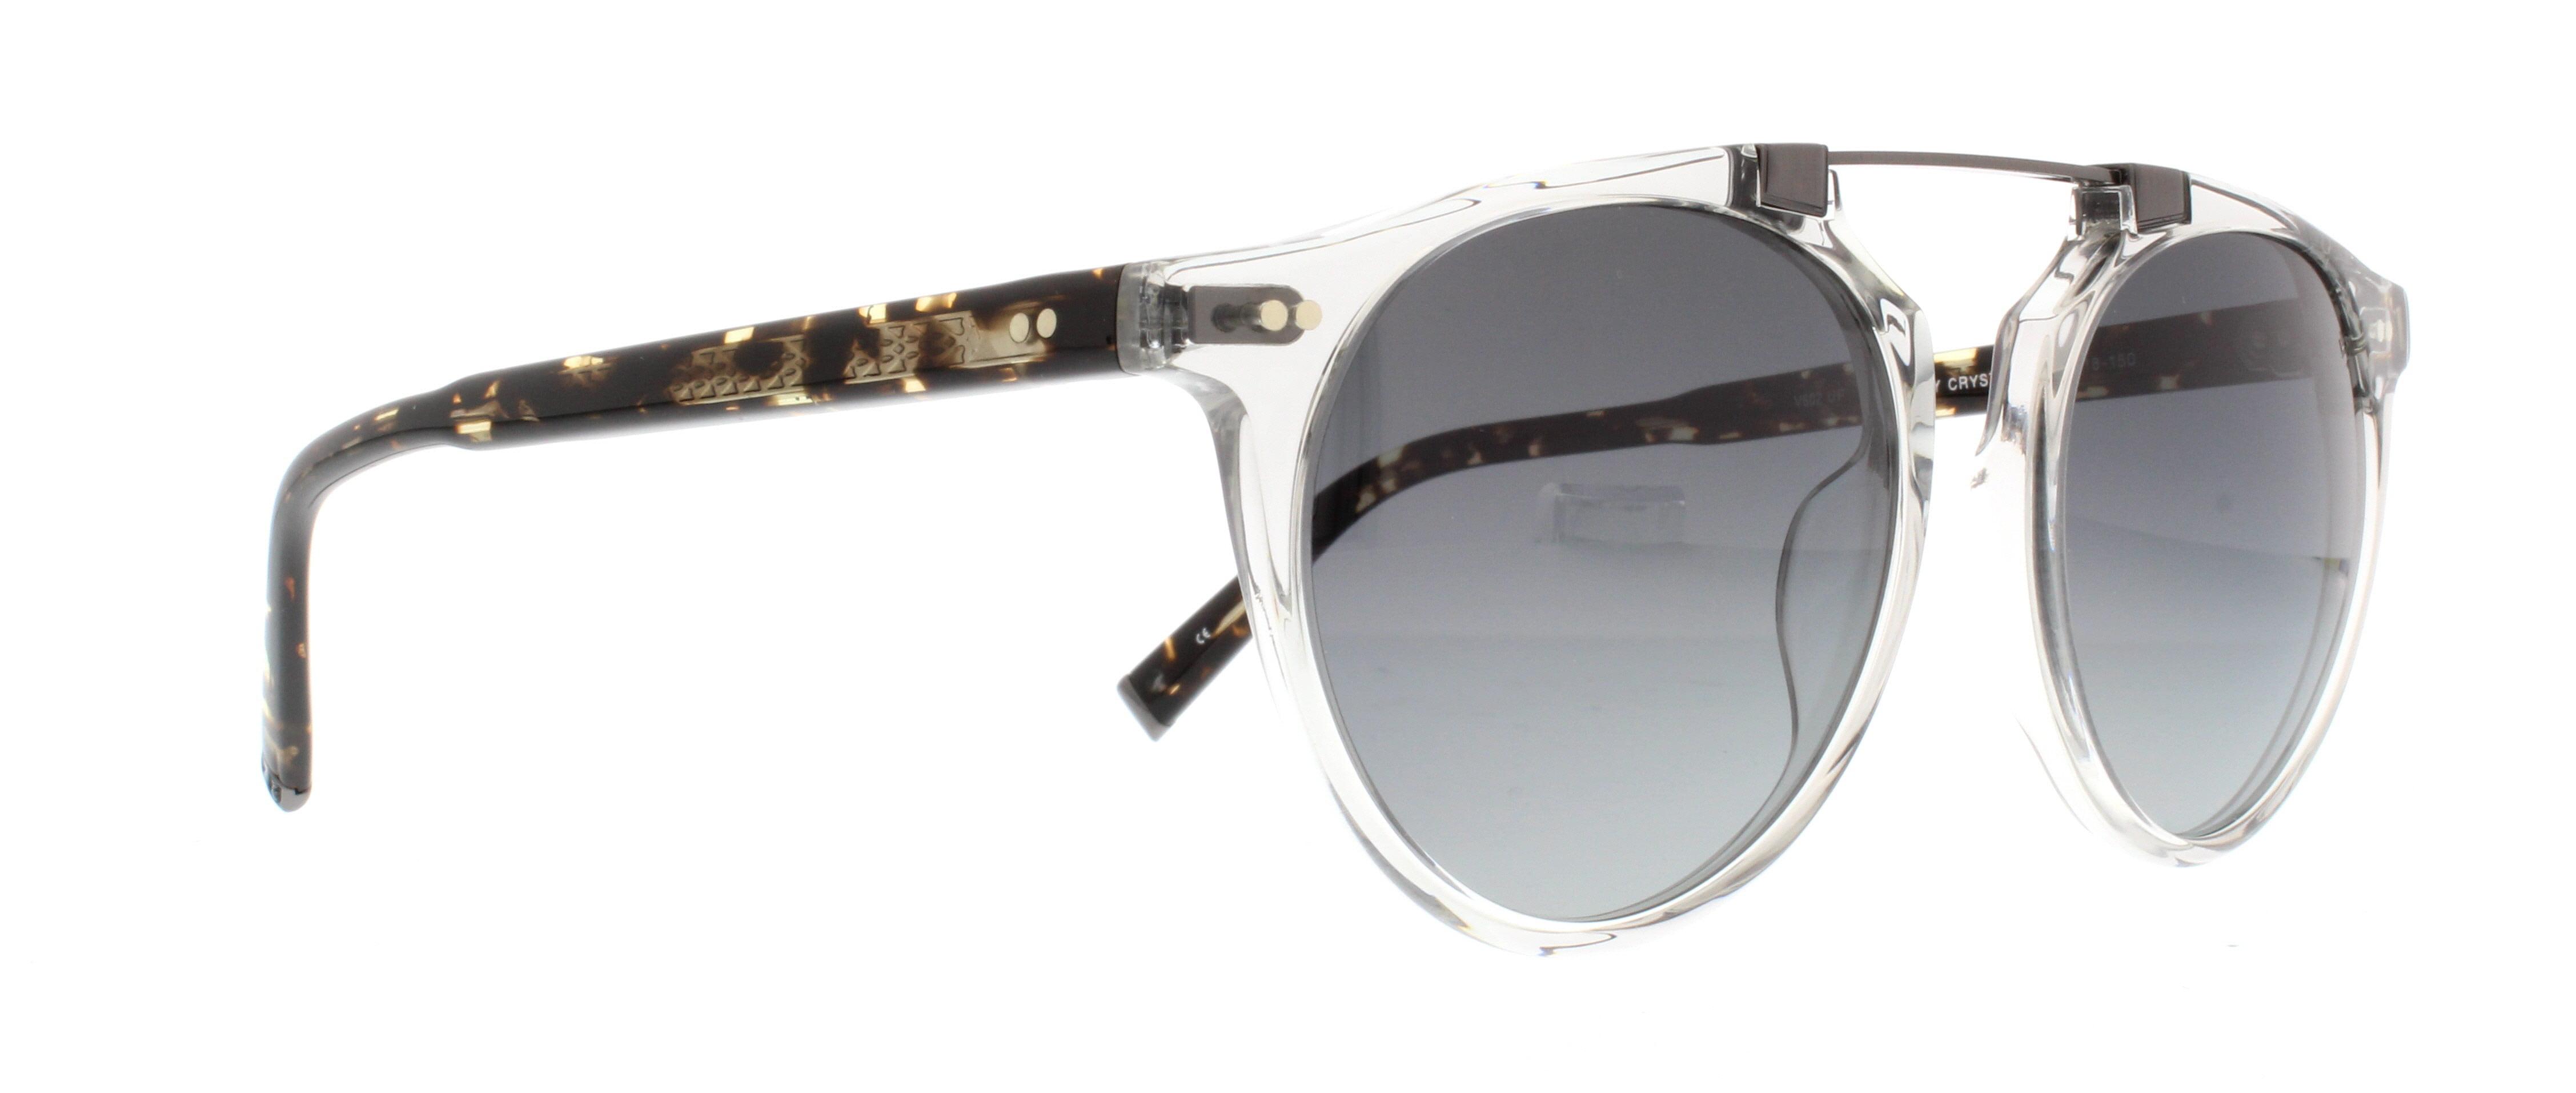 379dc234d79 John Varvatos - JOHN VARVATOS Sunglasses V602 UF Grey Crystal 52MM -  Walmart.com